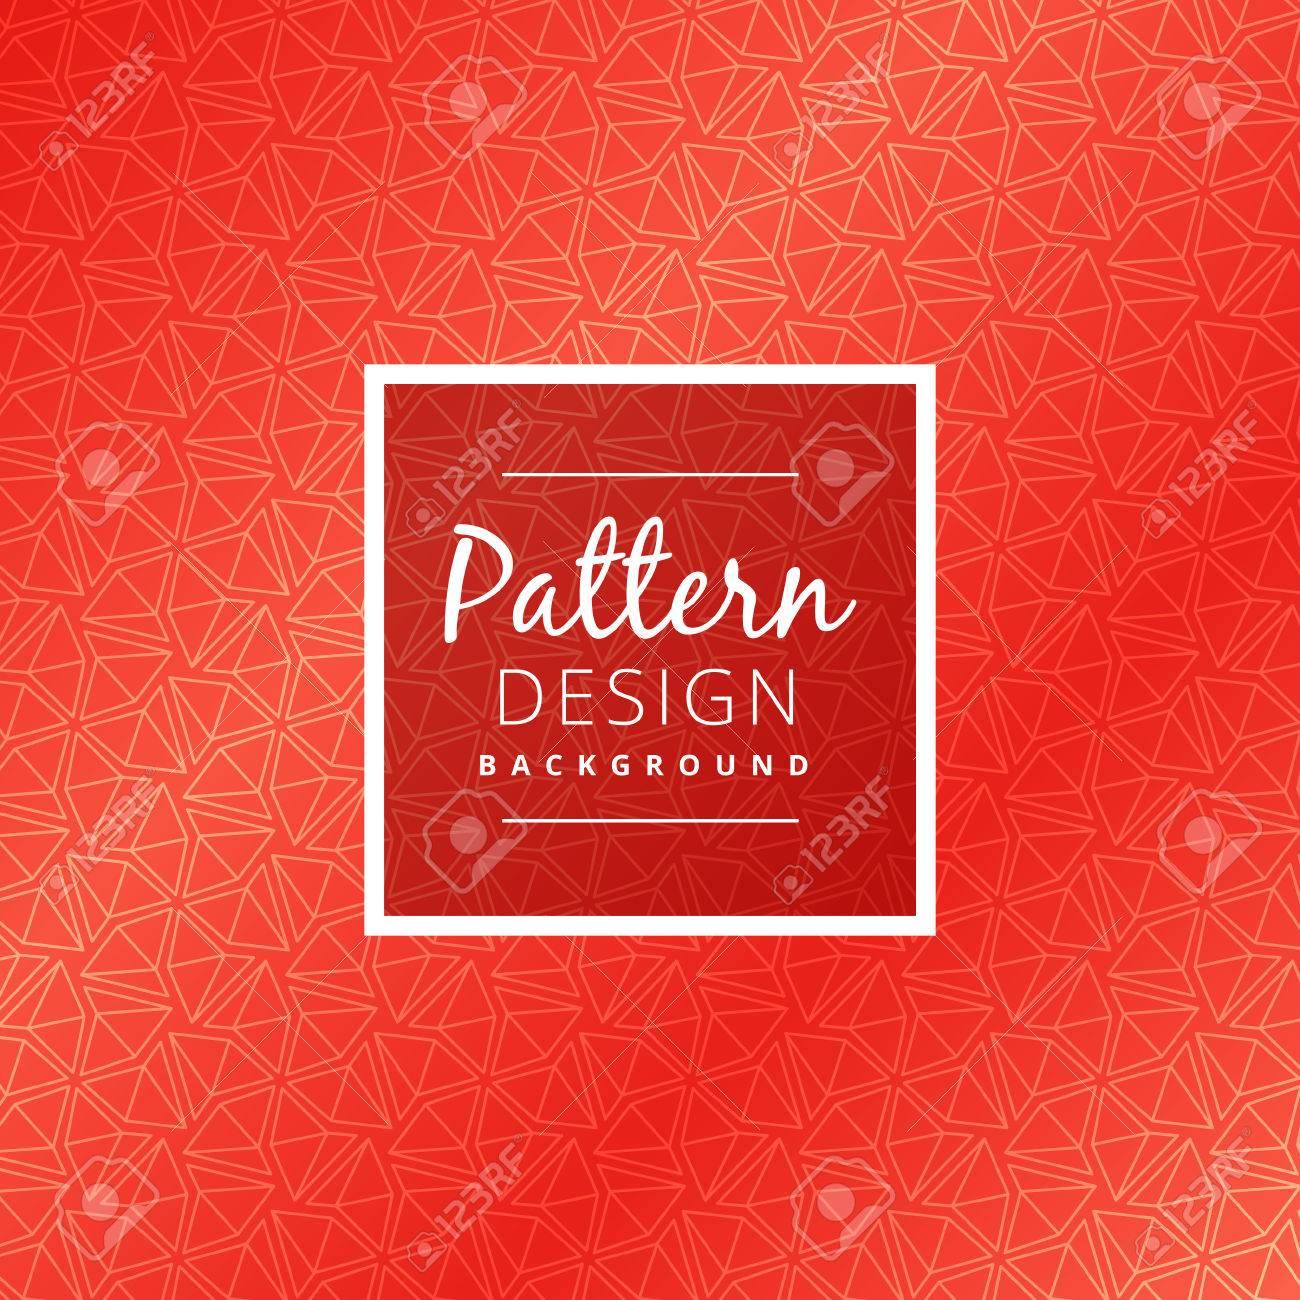 creative red pattern design - 57685879